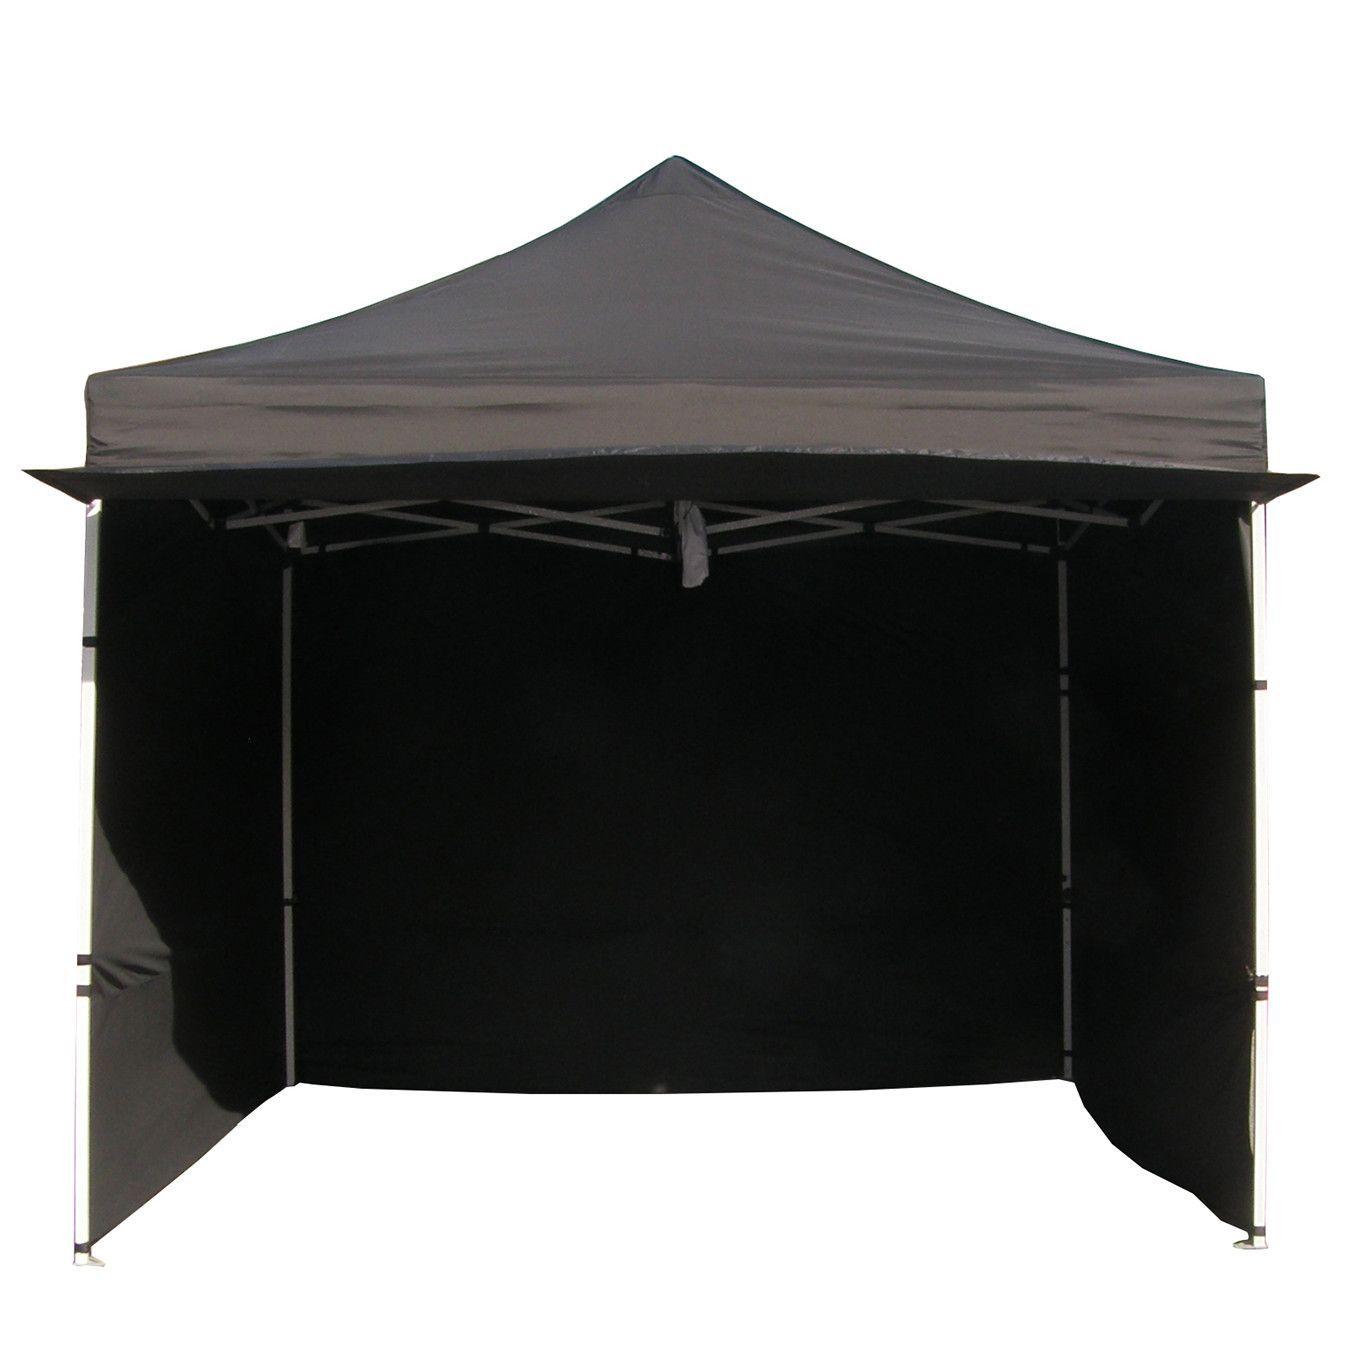 Alumix 10u0027x10u0027 EZ Pop Up Canopy Tent Instant Canopy Commercial Tent with Sidewalls  sc 1 st  Pinterest & Alumix 10u0027x10u0027 EZ Pop Up Canopy Tent Instant Canopy Commercial ...